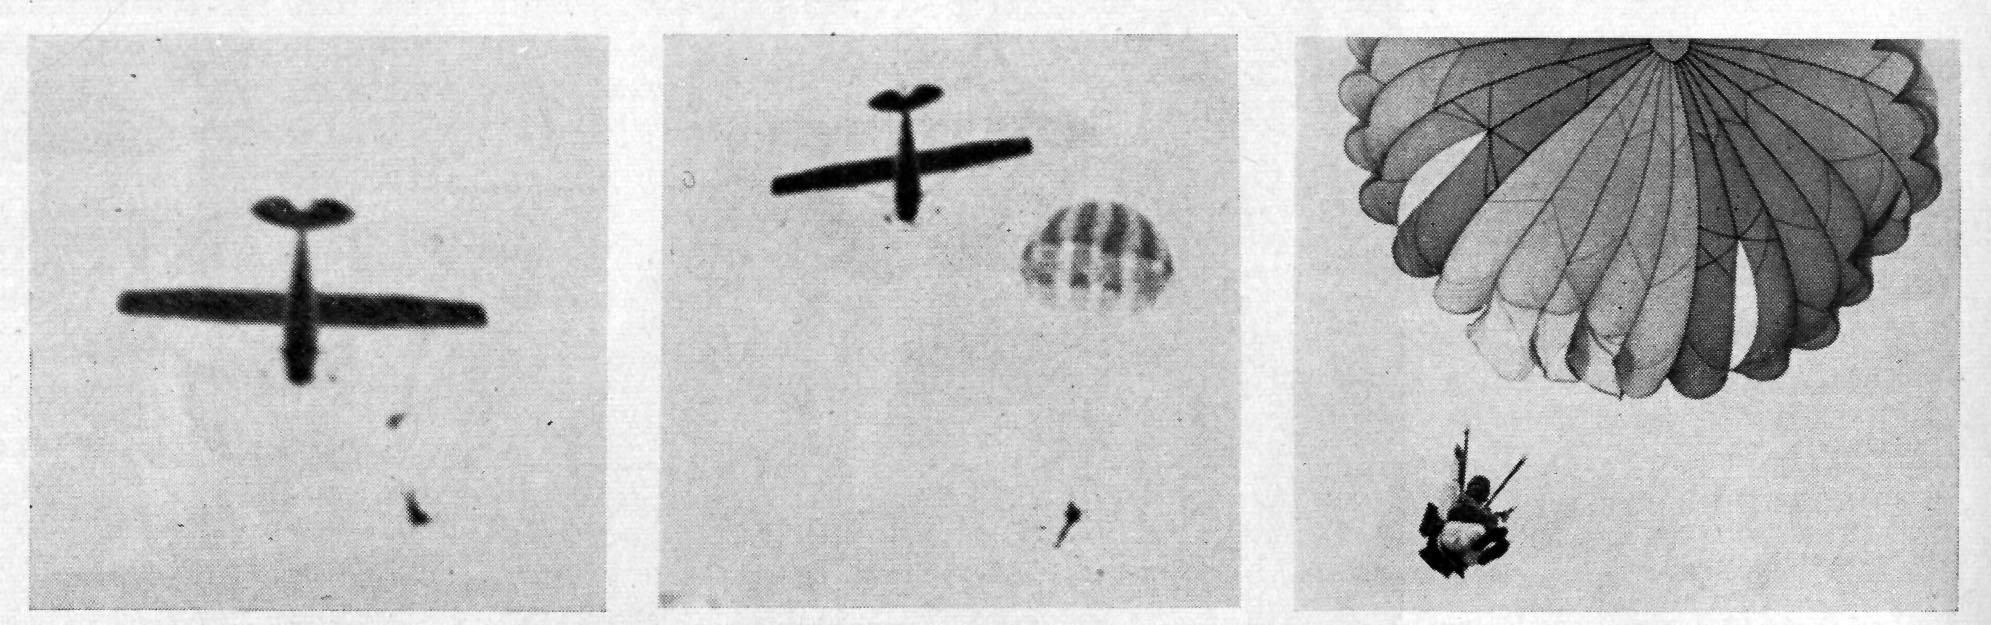 My father parachuting essay